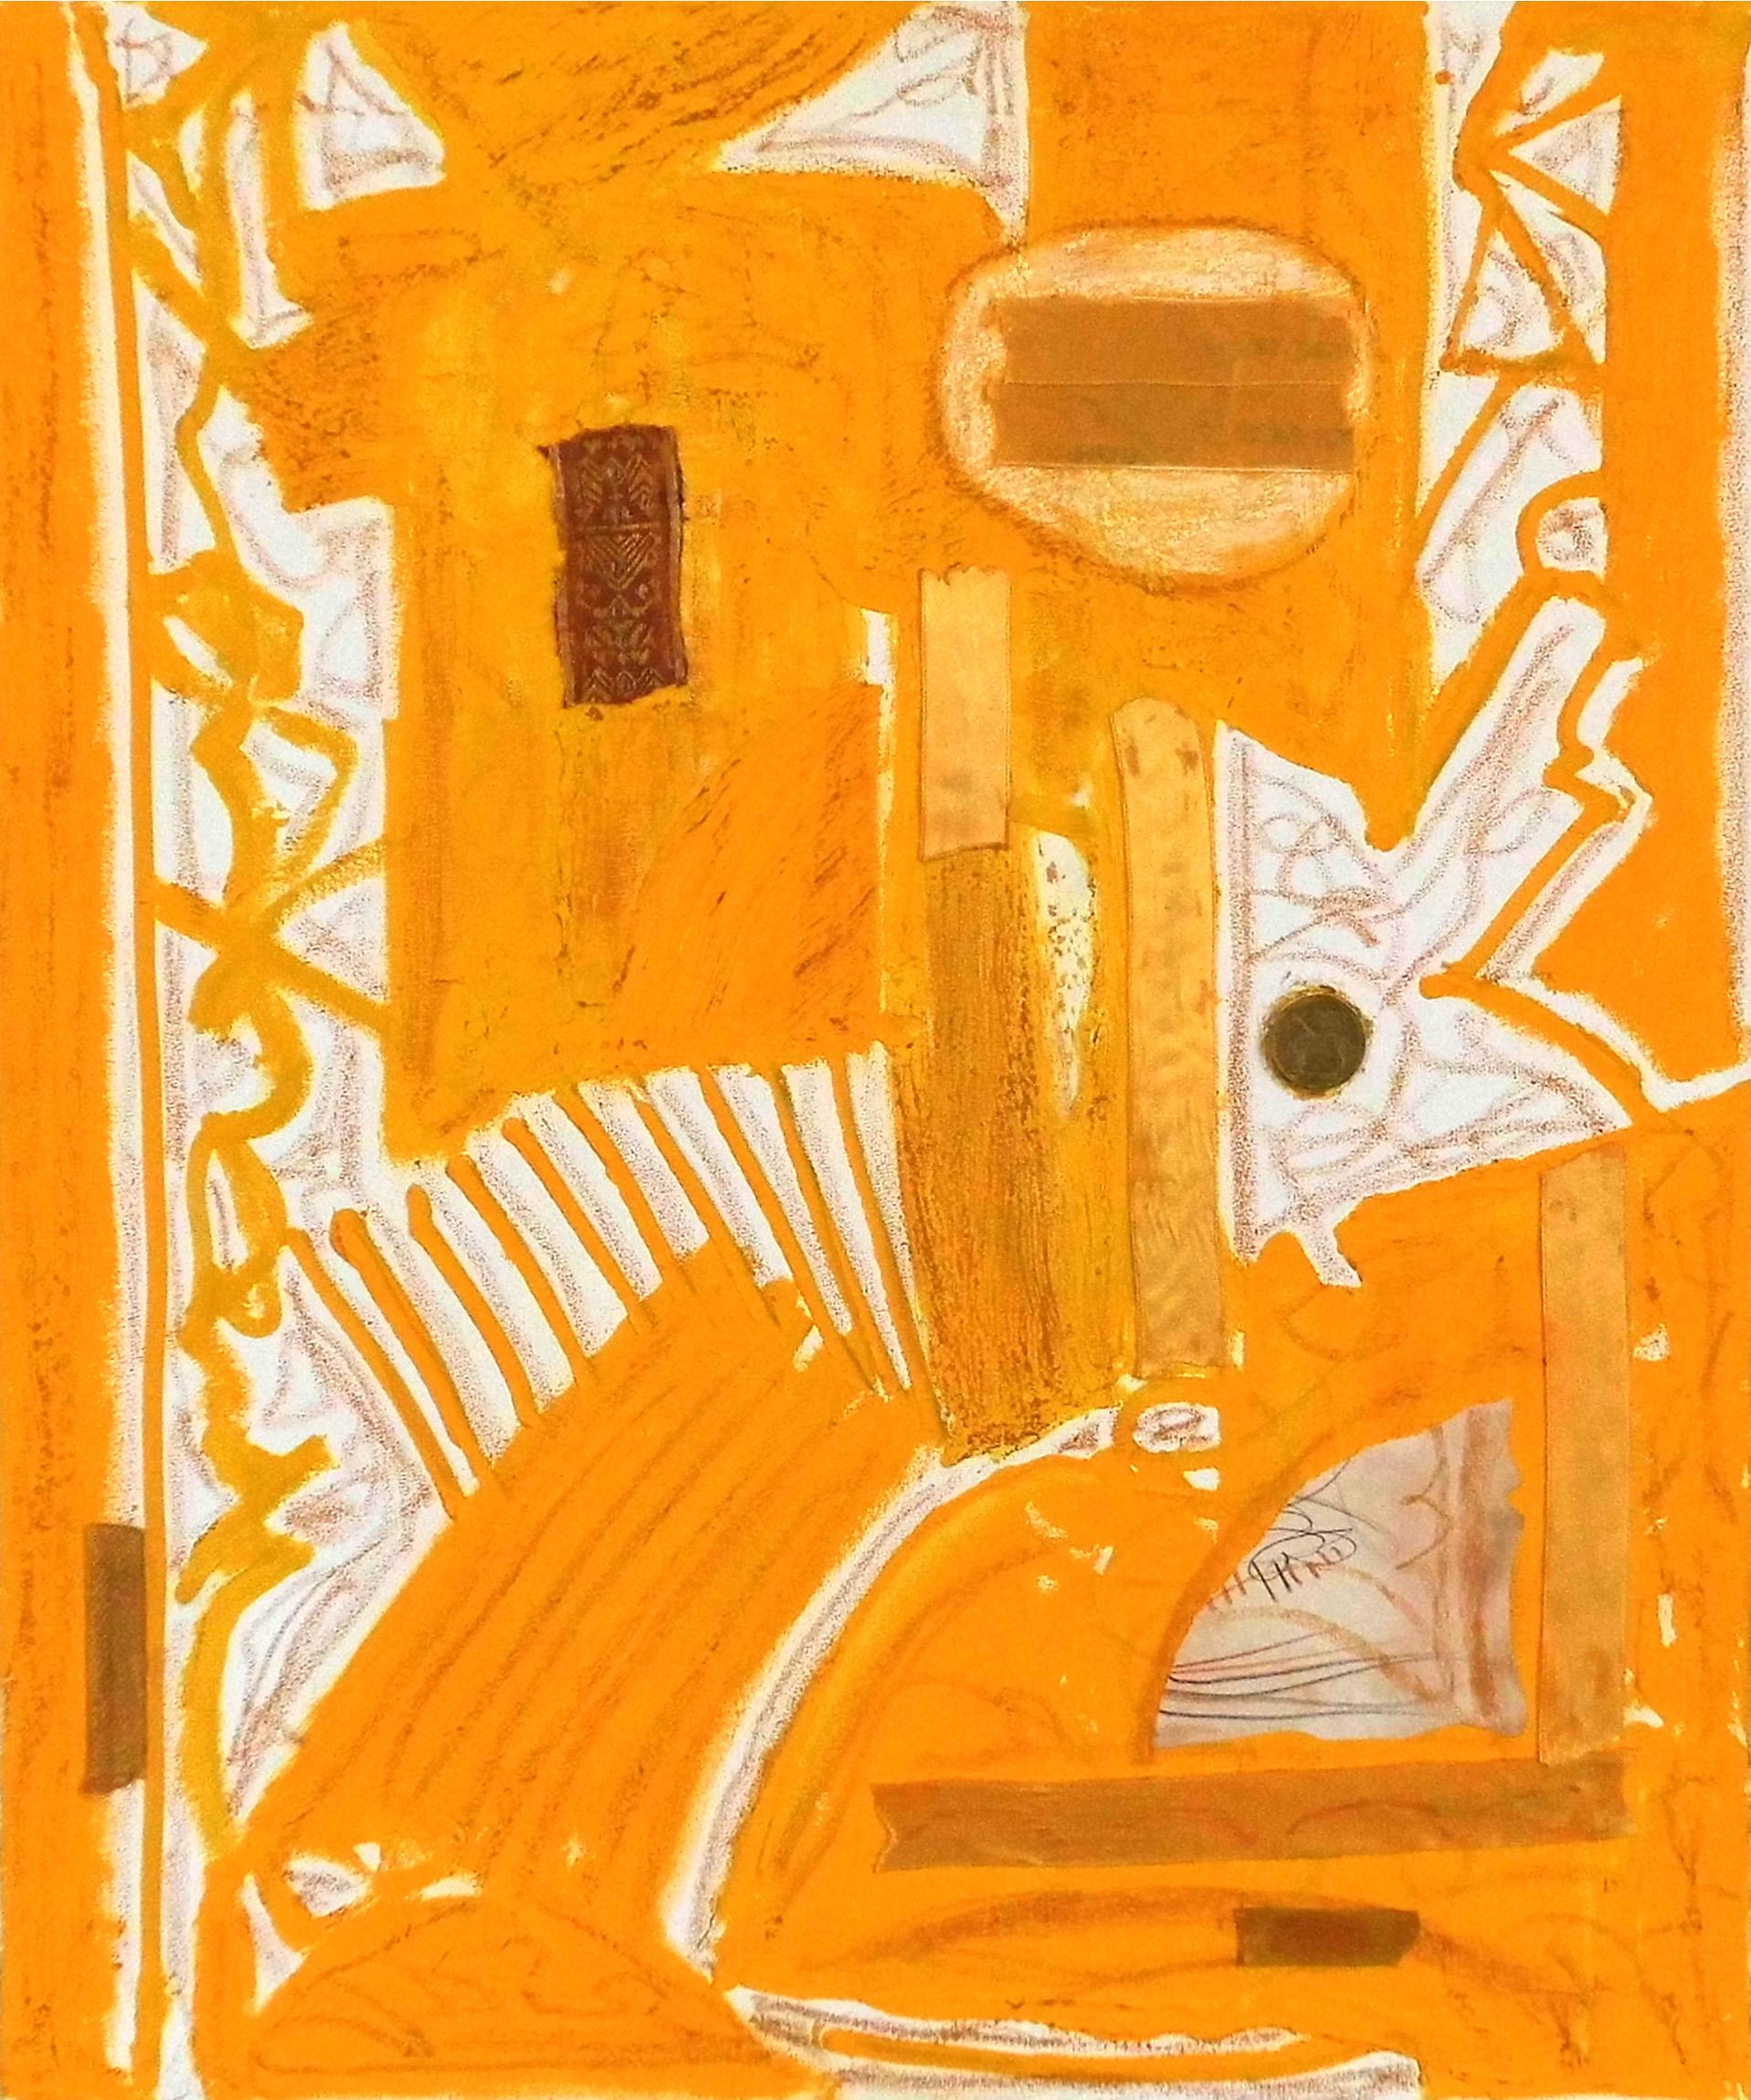 15-Strawalde-Für Dobsy-2015-Öl auf Leinwand-60x50